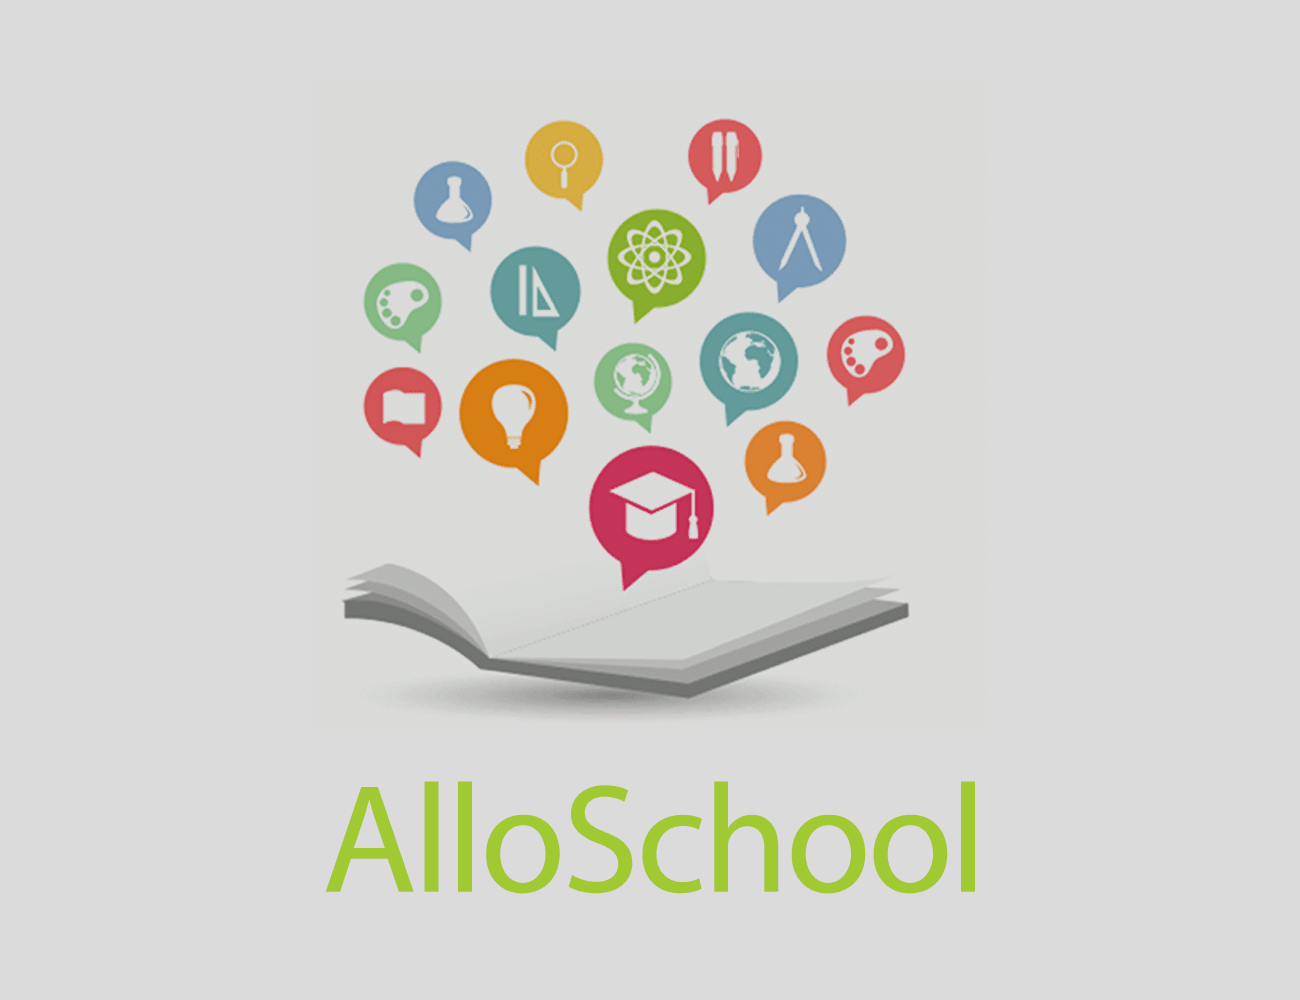 AlloSchool